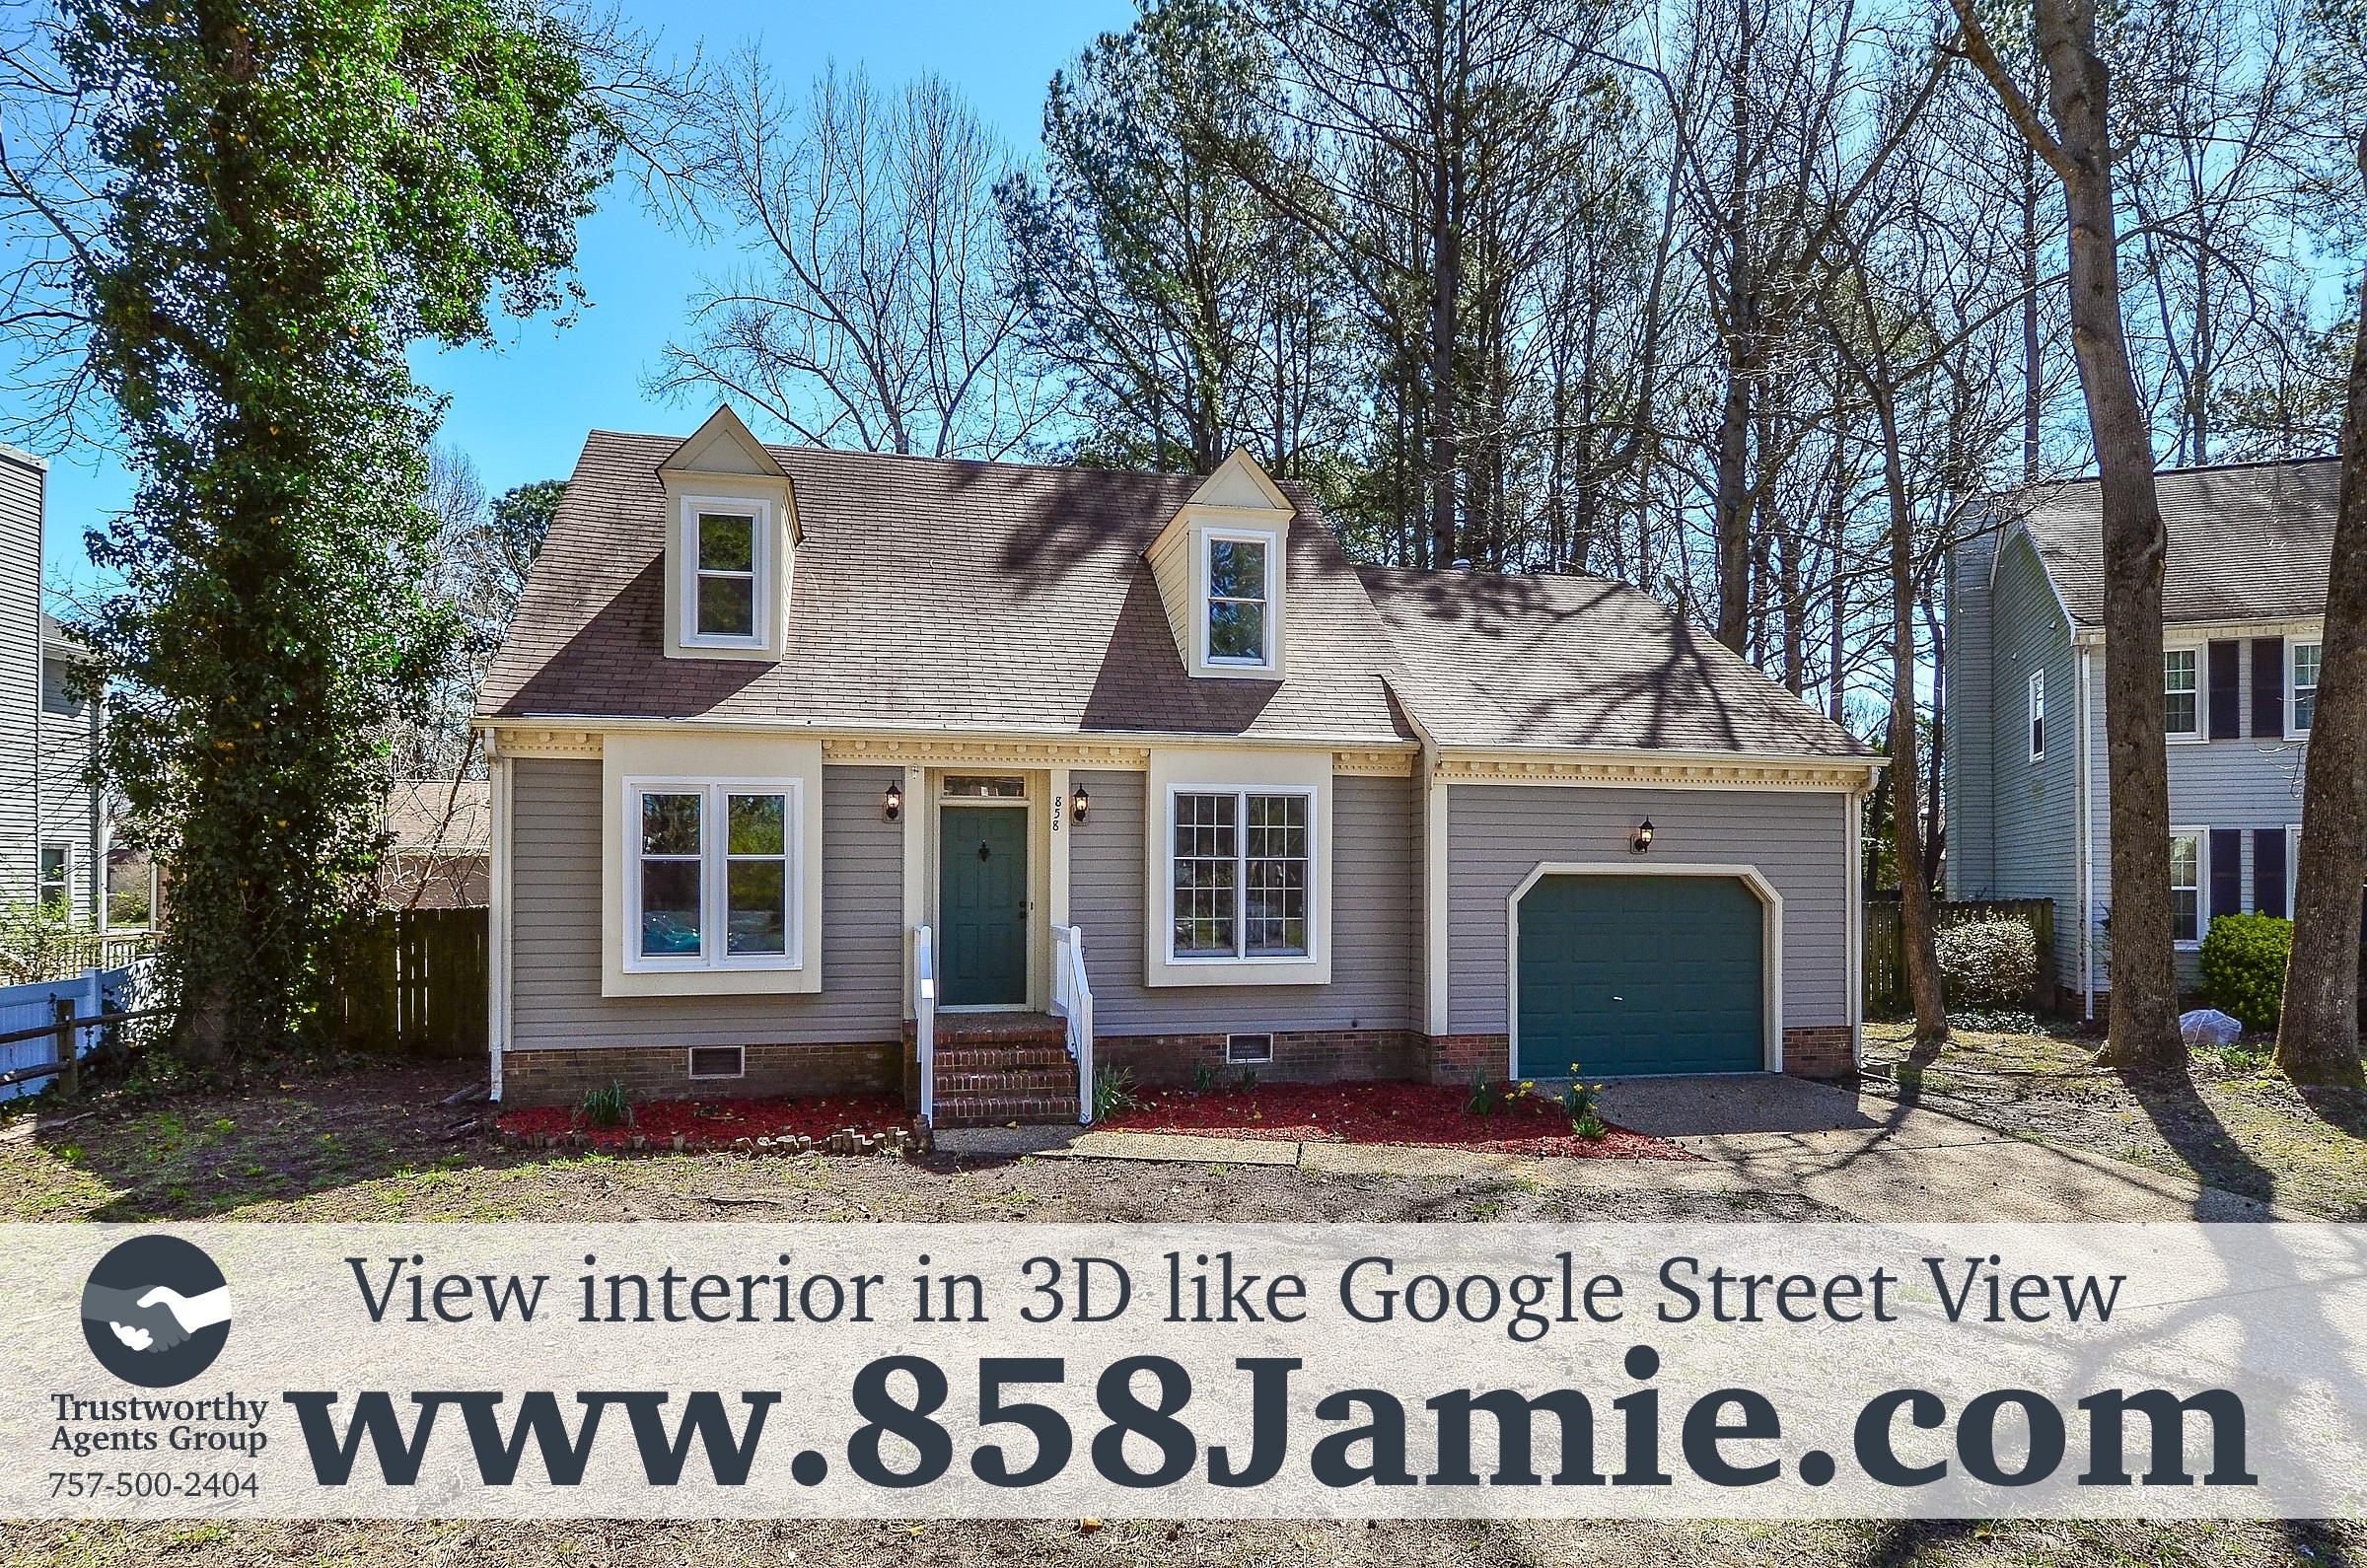 Home For Sale 858 Jamie Ct Newport News Va 23608